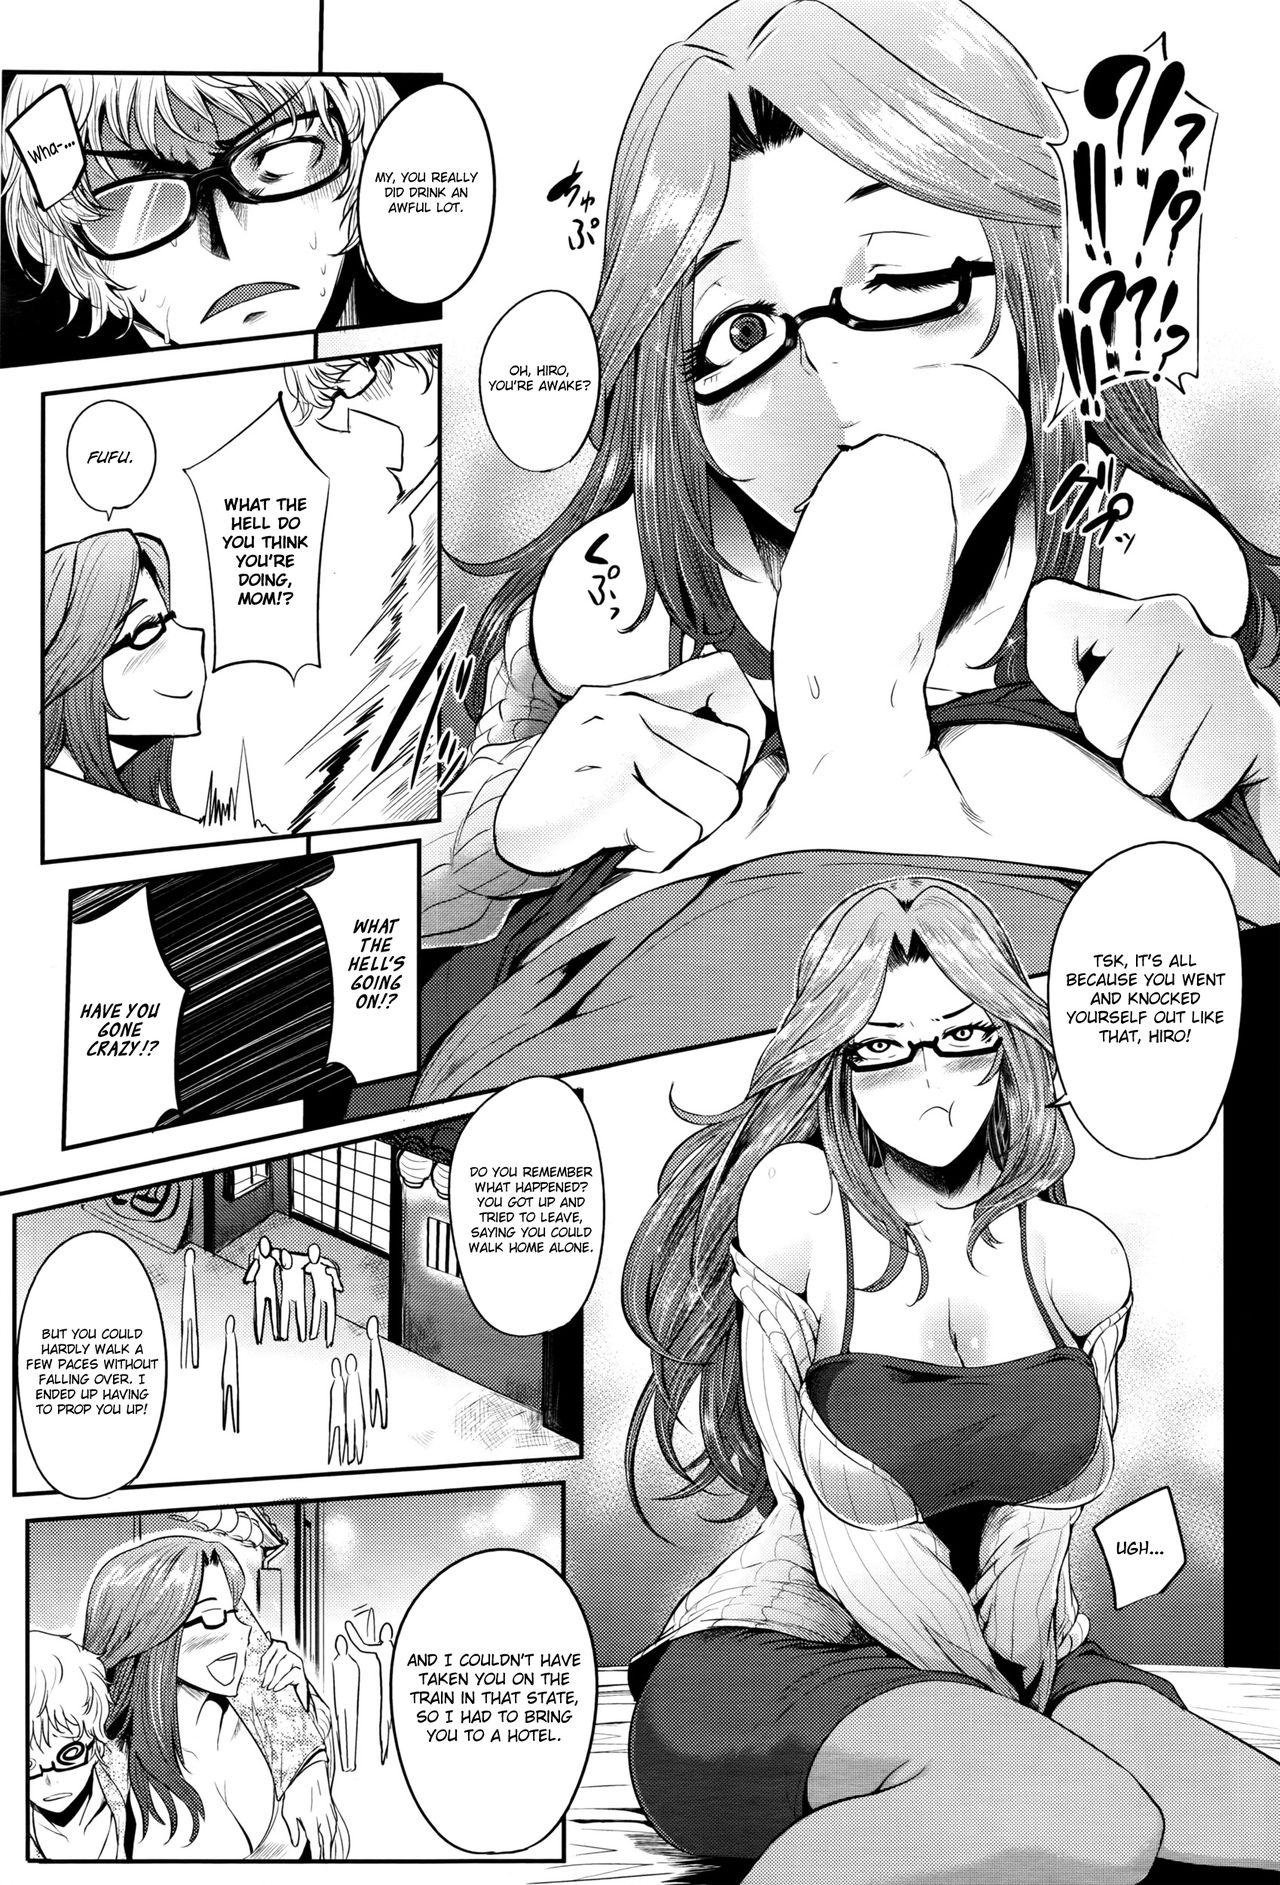 Hatsu Goukon wa Mama Naranai! | My First Mixer Was a Real Motherfucker! 6